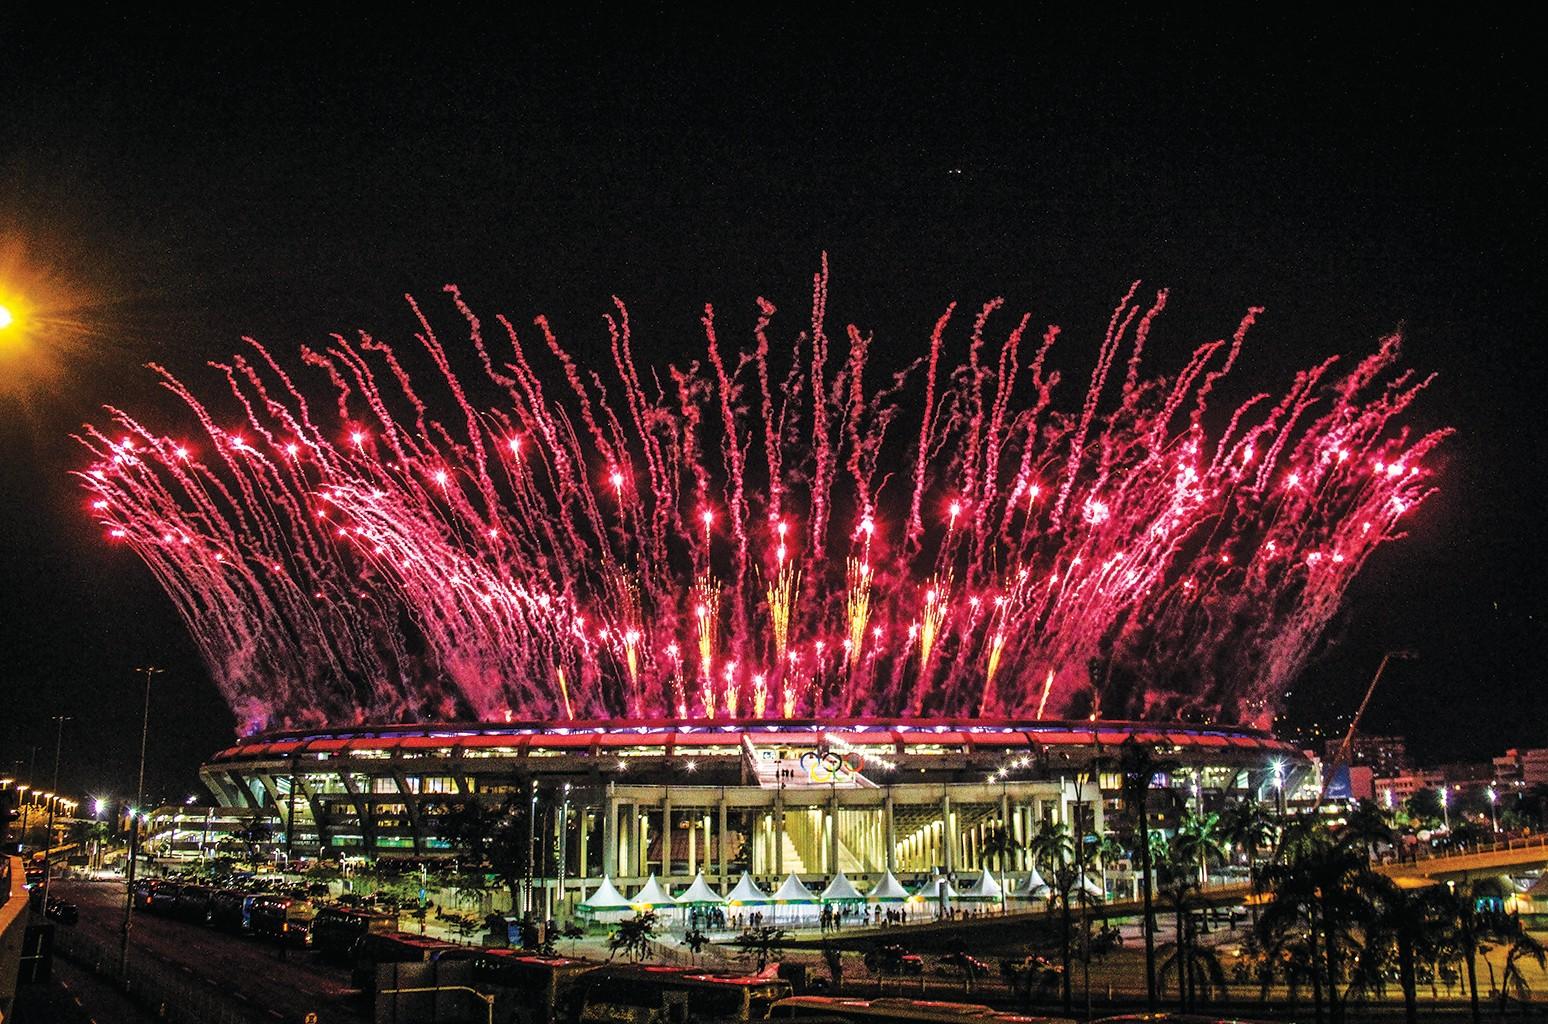 Fireworks at Rio de Janeiro's Maracana Stadium during the opening ceremonies of the Summer Olympics.